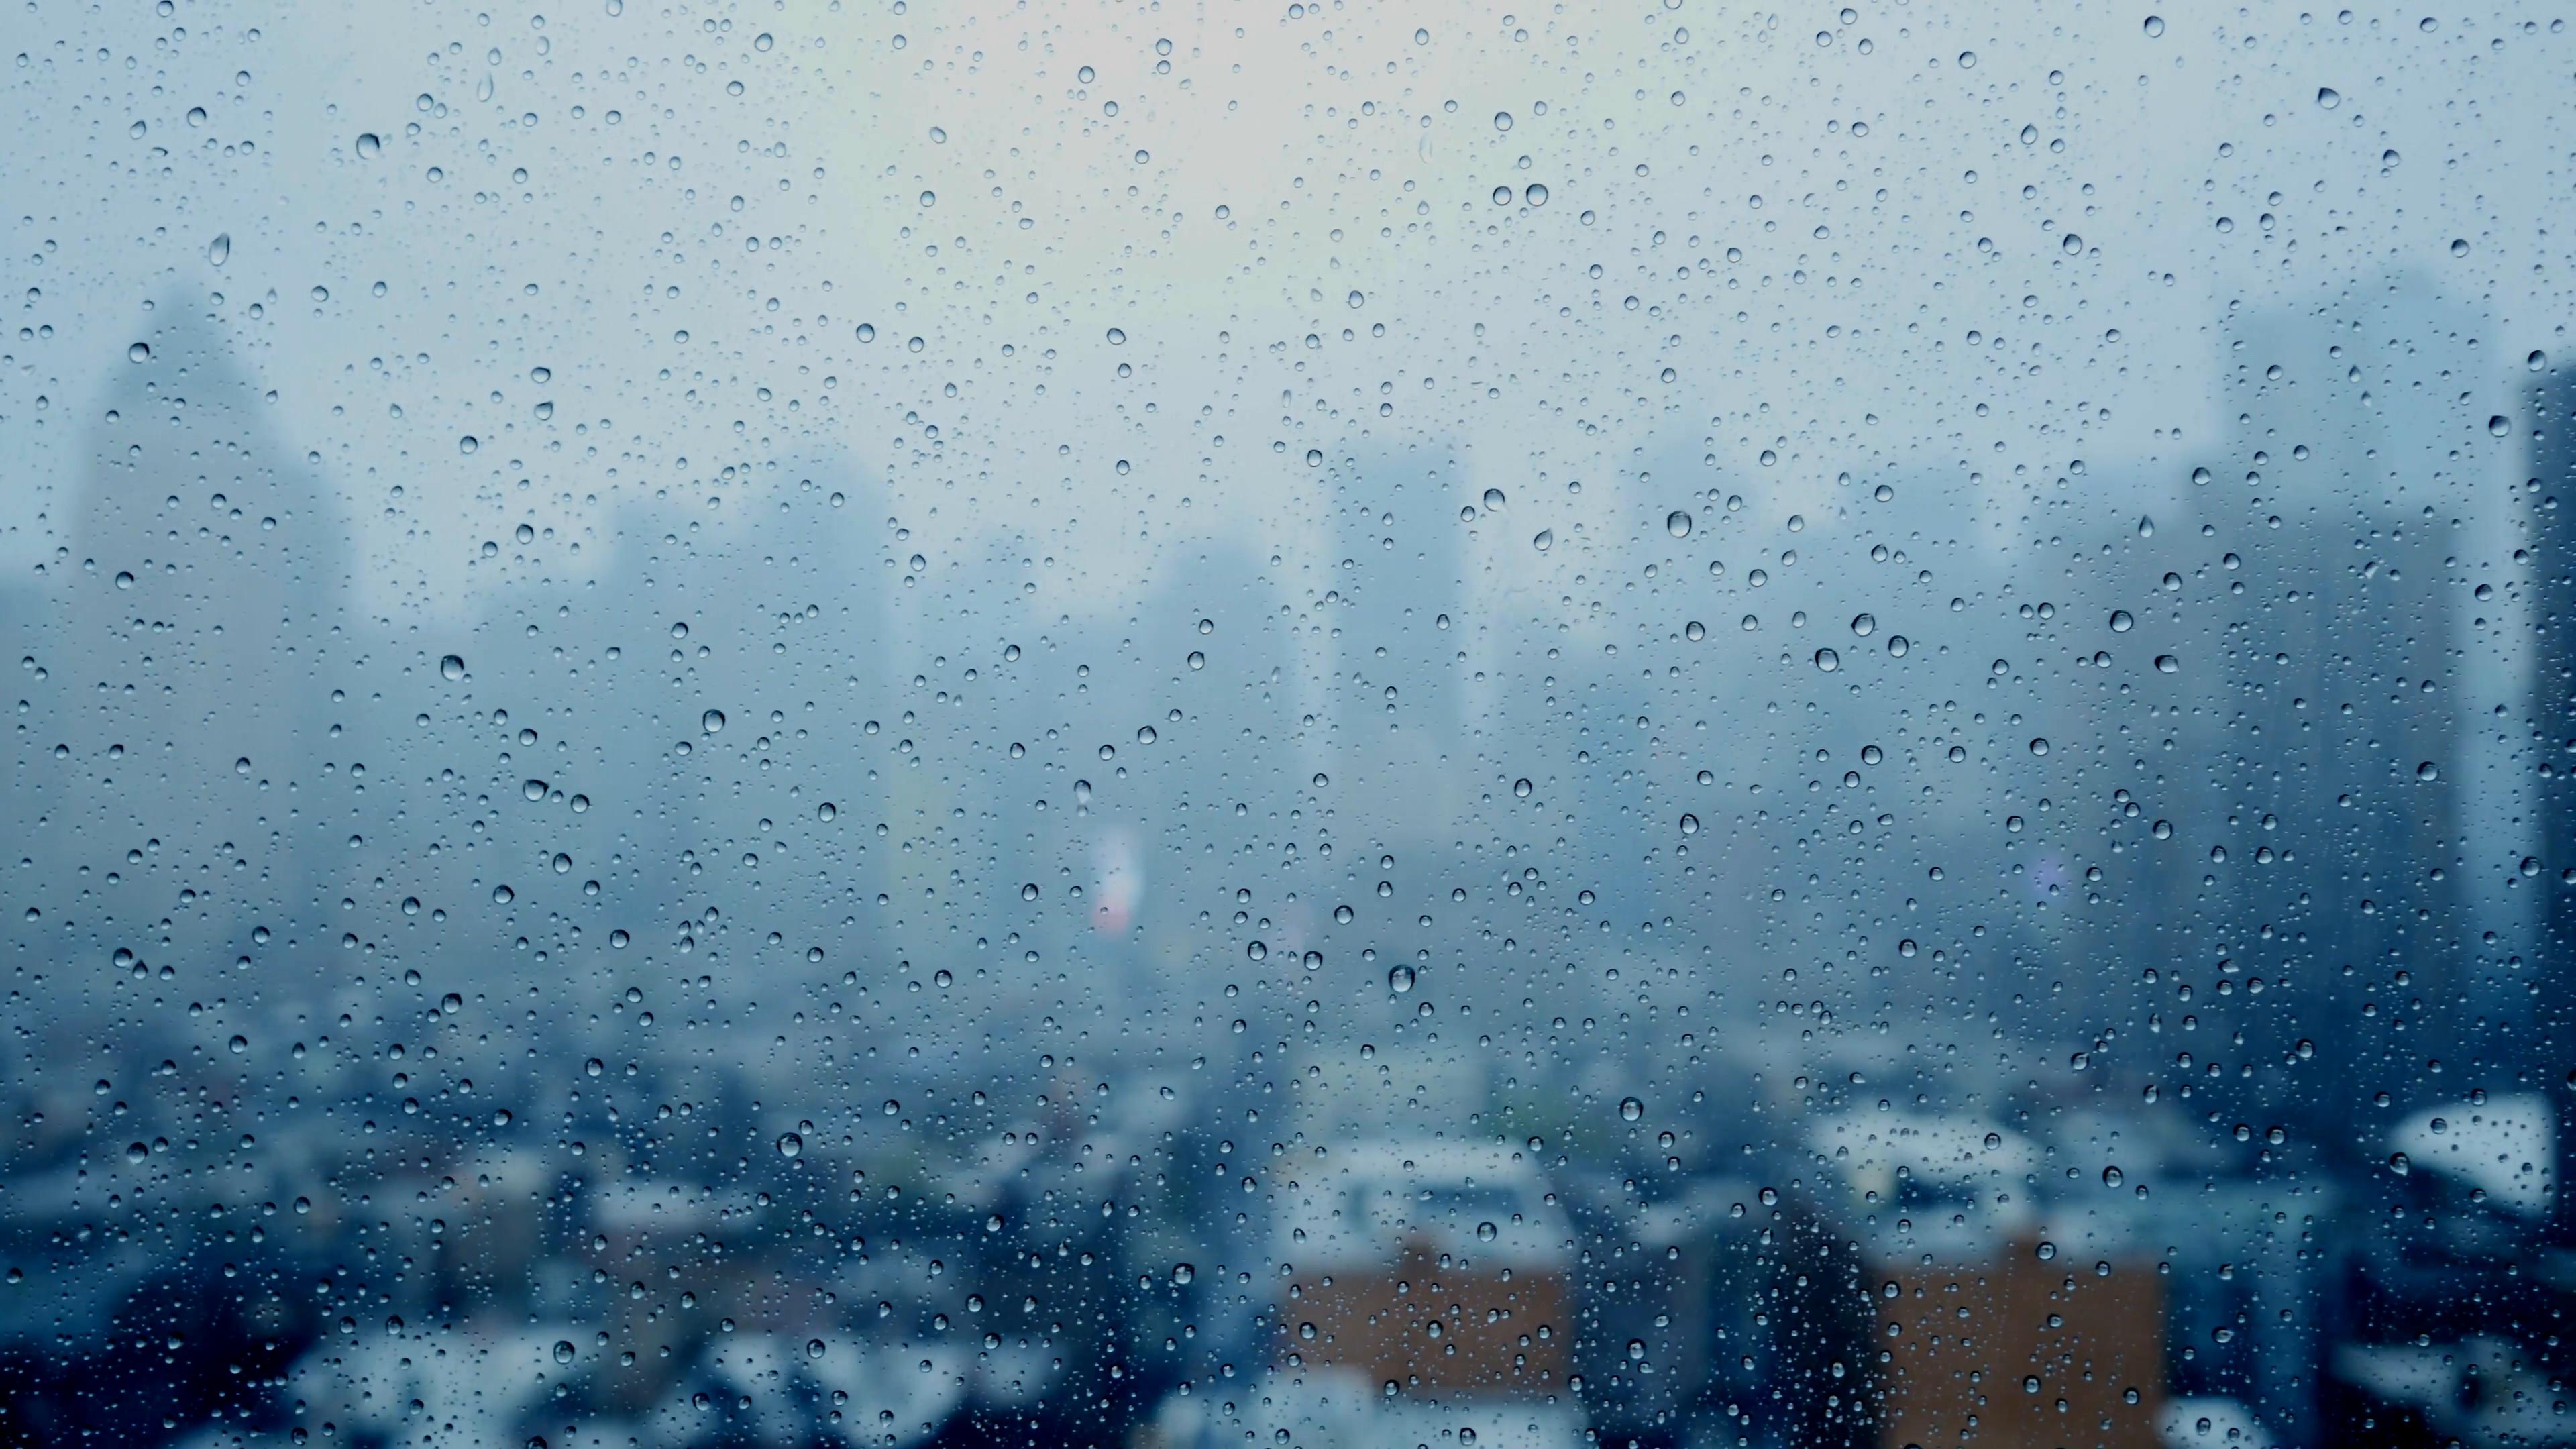 raindrops background 183��